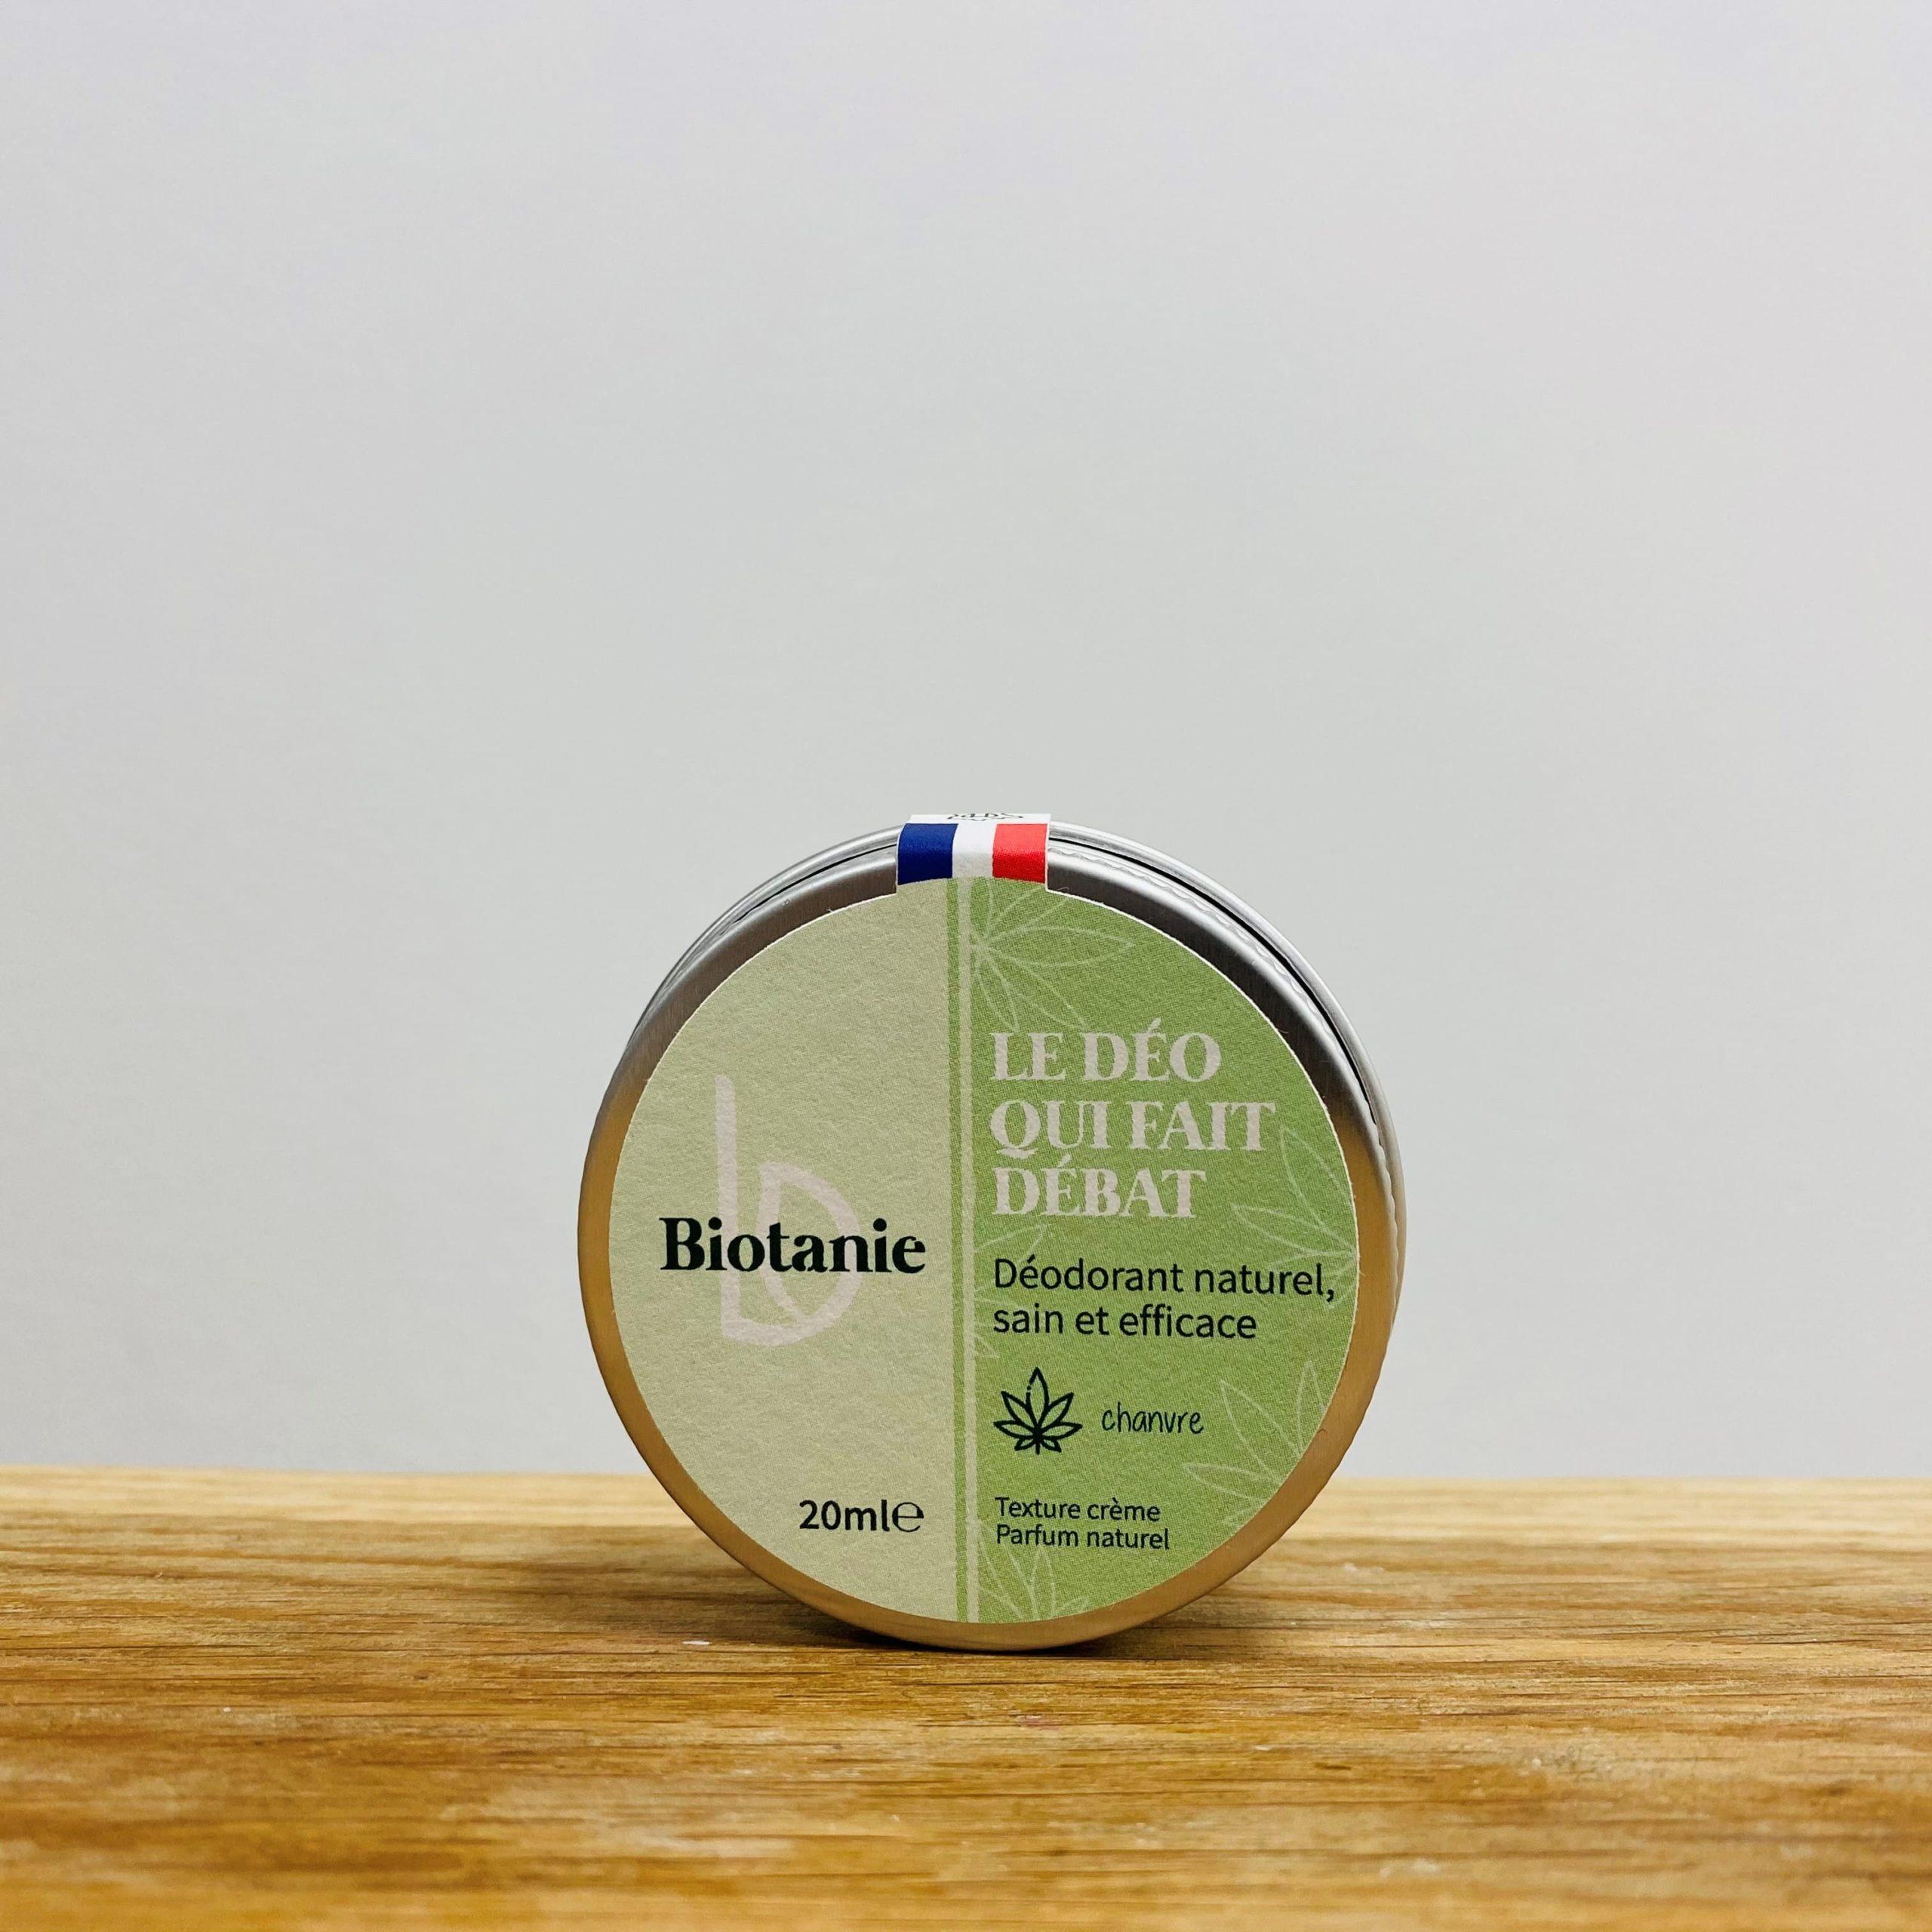 Biotanie déodorant crème